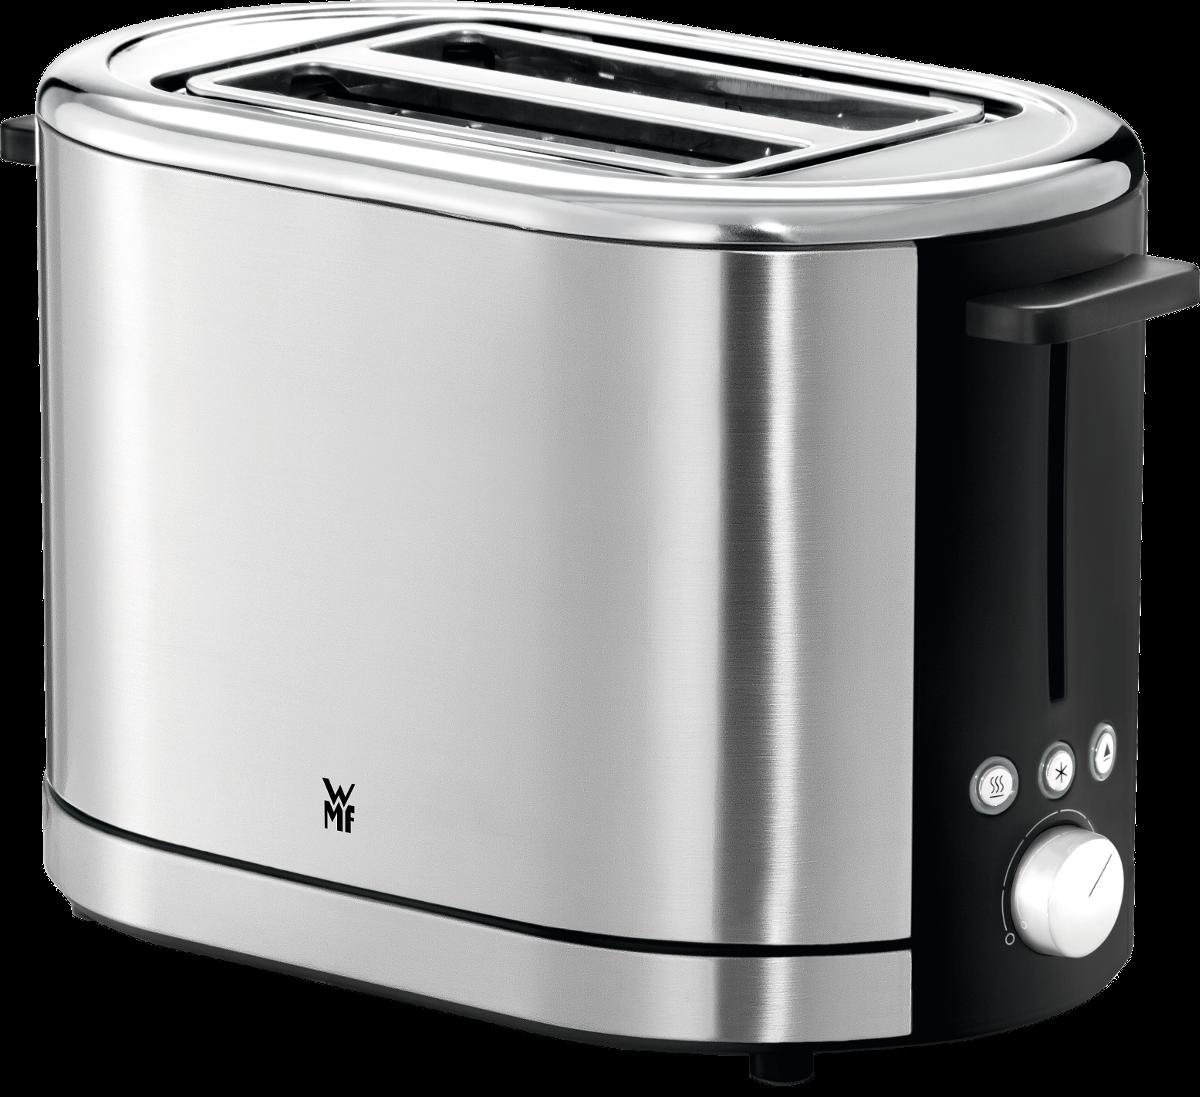 wmf lono toaster g nstig kaufen toaster media markt. Black Bedroom Furniture Sets. Home Design Ideas